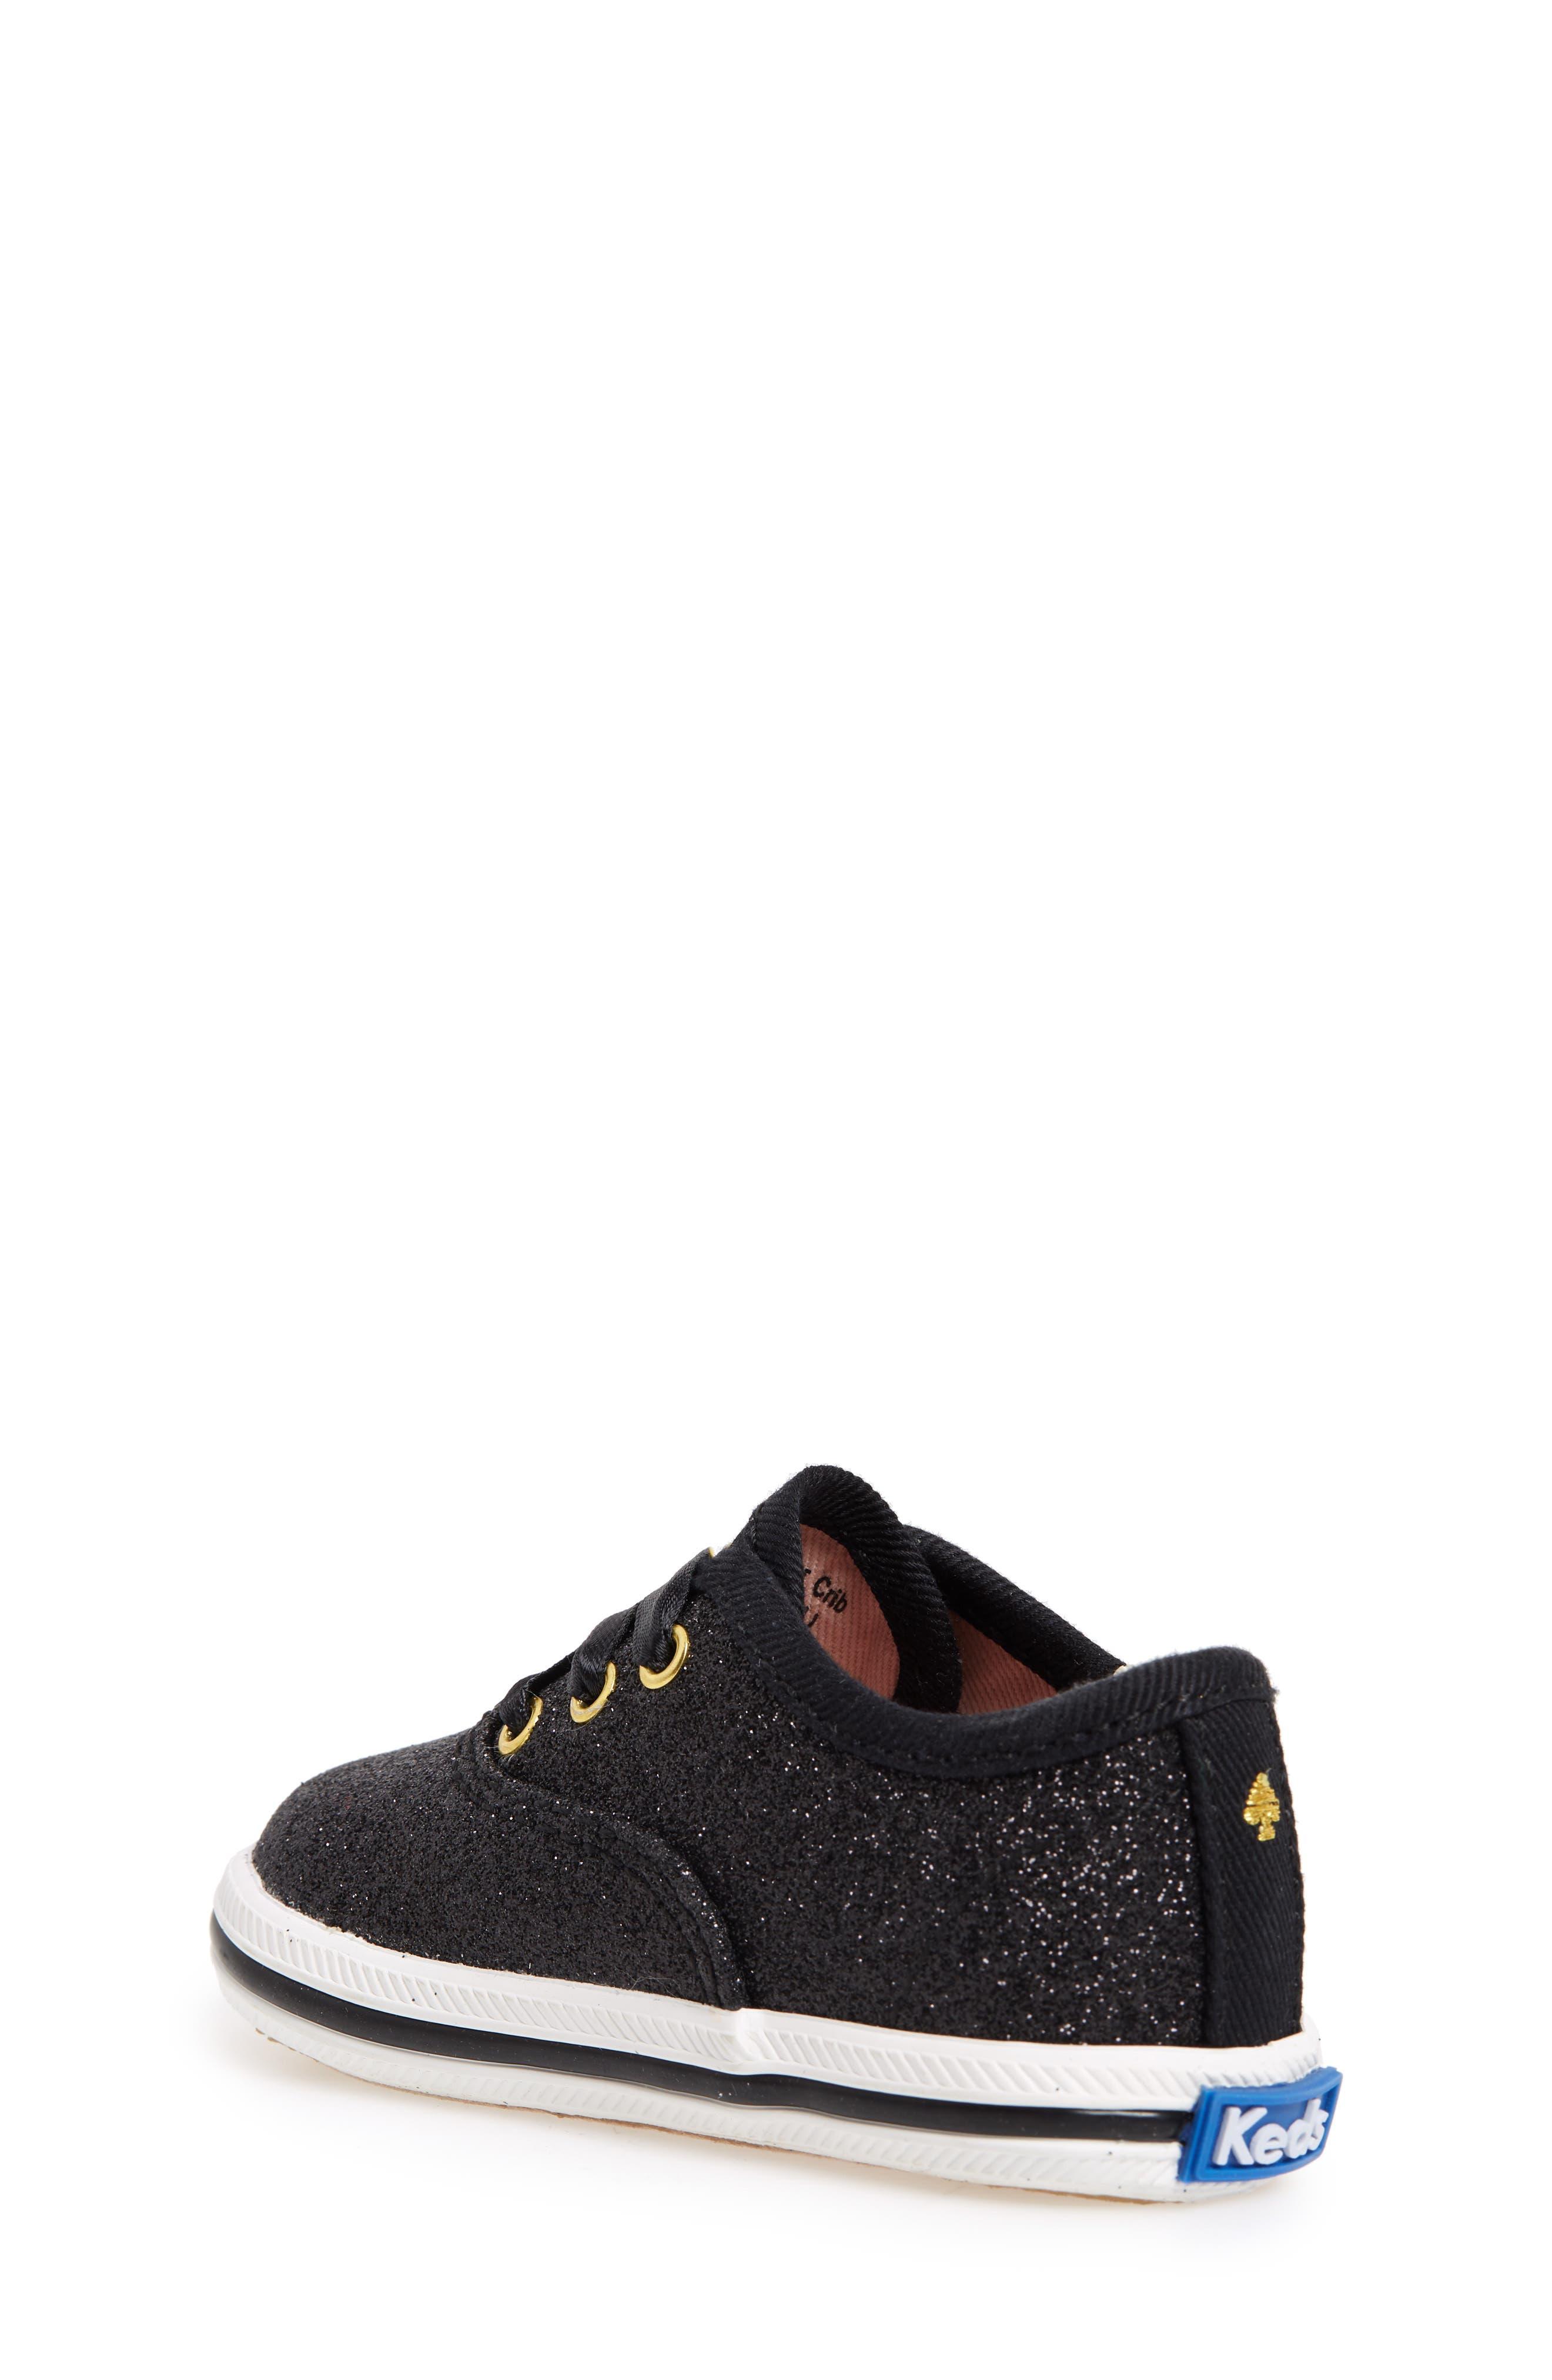 x kate spade new york Champion Glitter Crib Shoe,                             Alternate thumbnail 2, color,                             Black